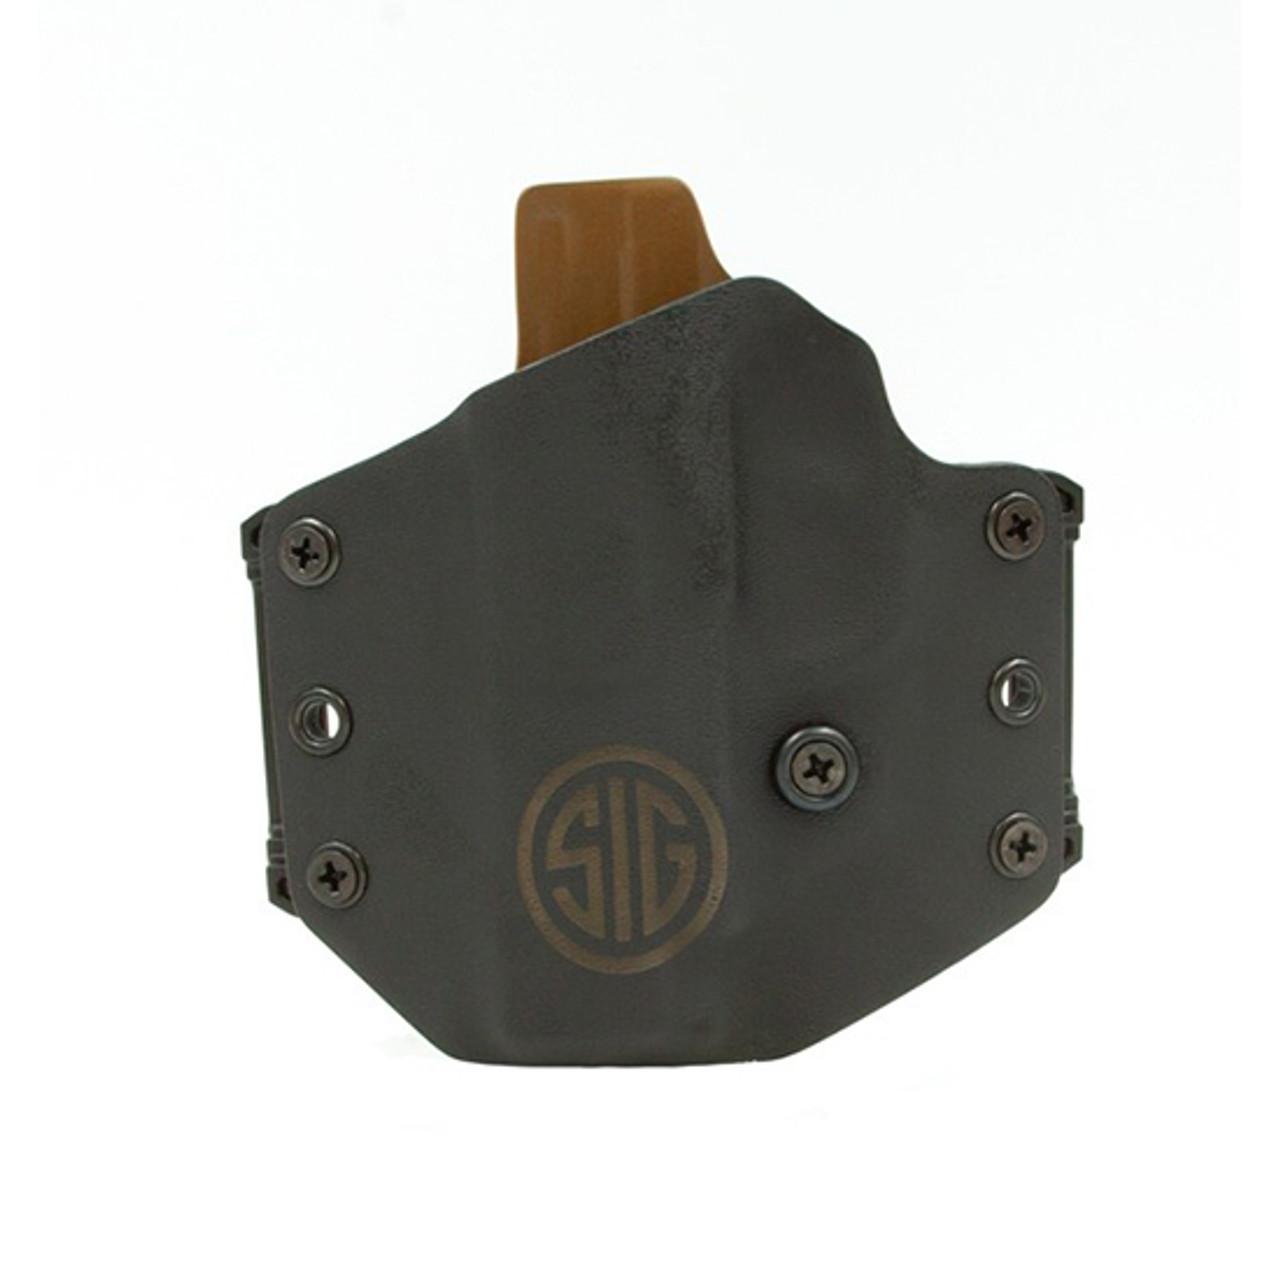 On Duty Conceal RH LH OWB Leather Gun Holster For Kahr CM MK PM 9 40 45